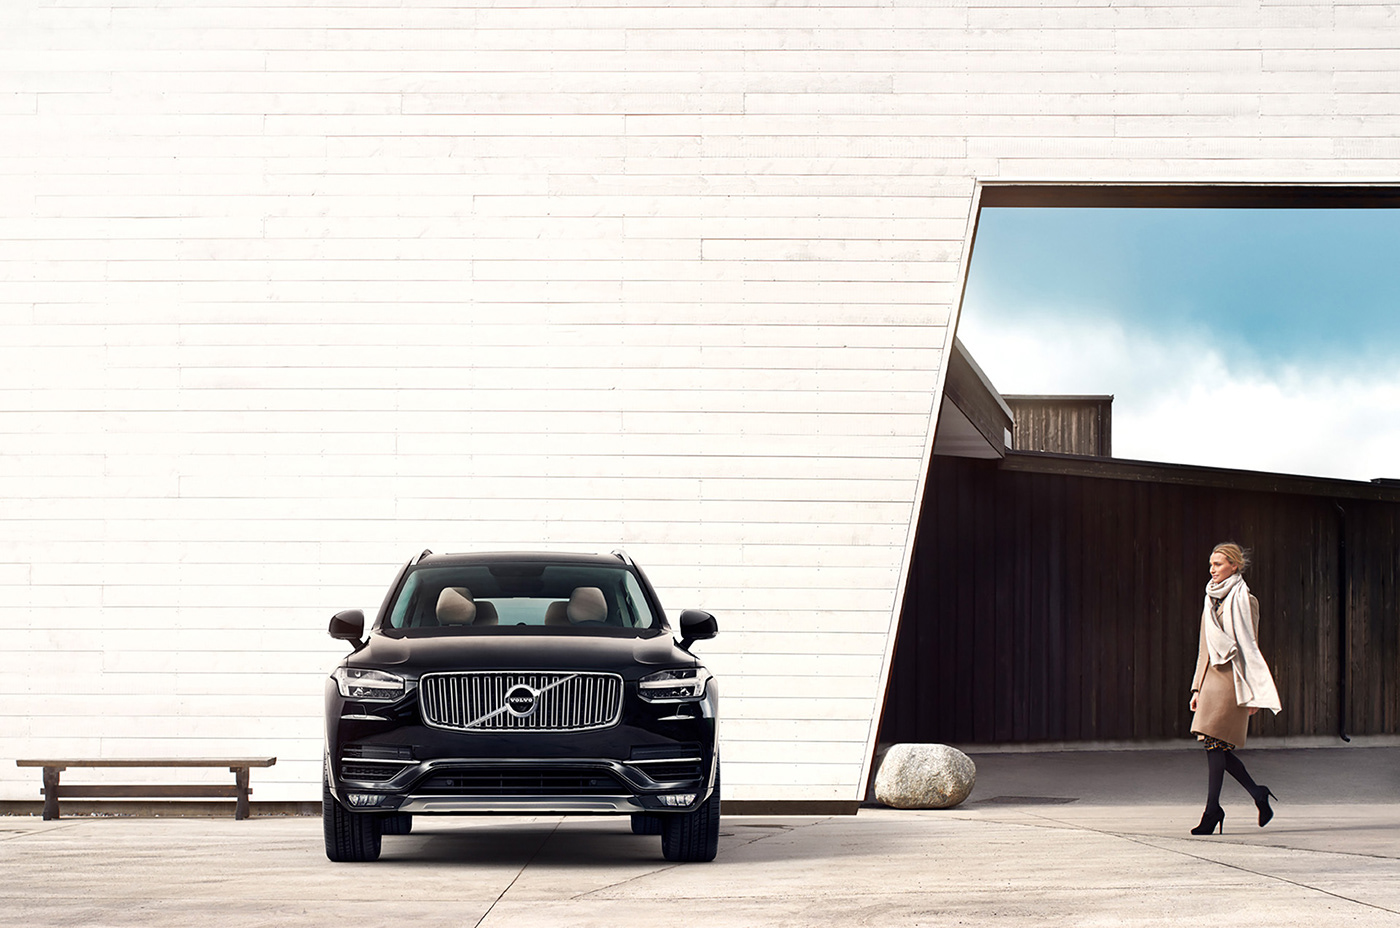 CGI image for Volvo. Women walking towards a black SUV XC90.